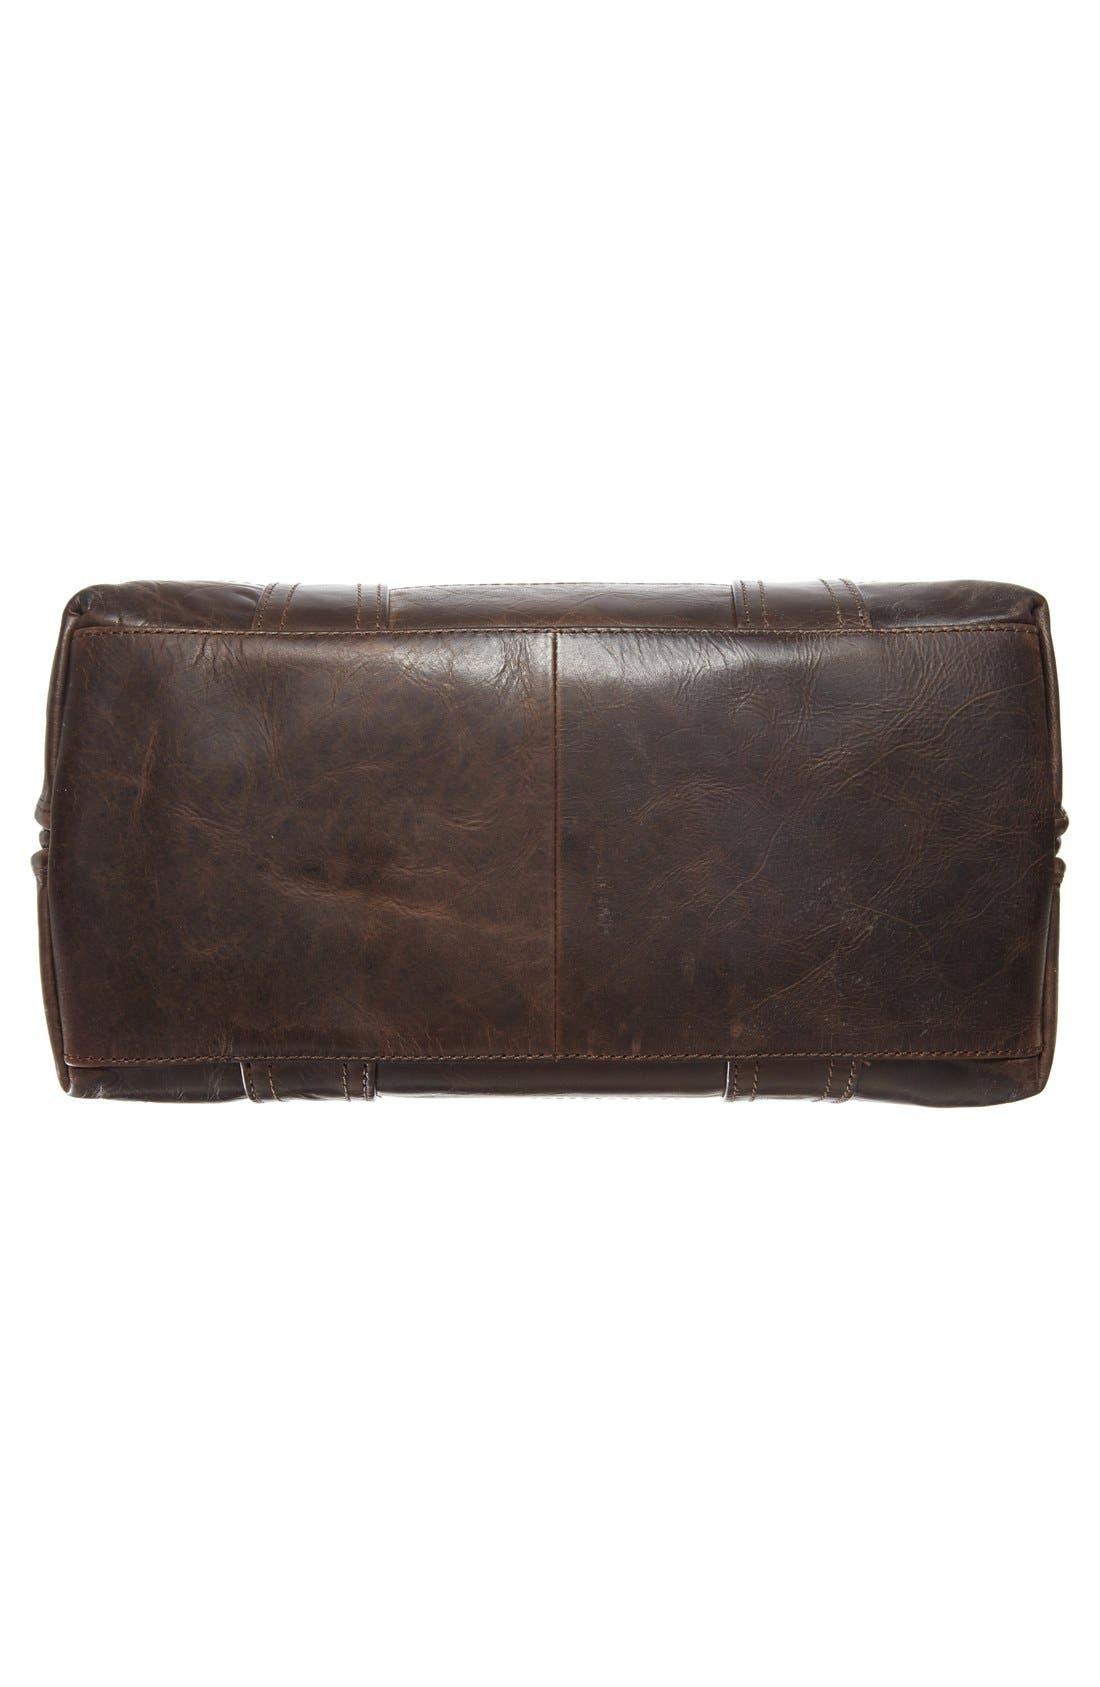 'Melissa' Domed Leather Satchel,                             Alternate thumbnail 6, color,                             020